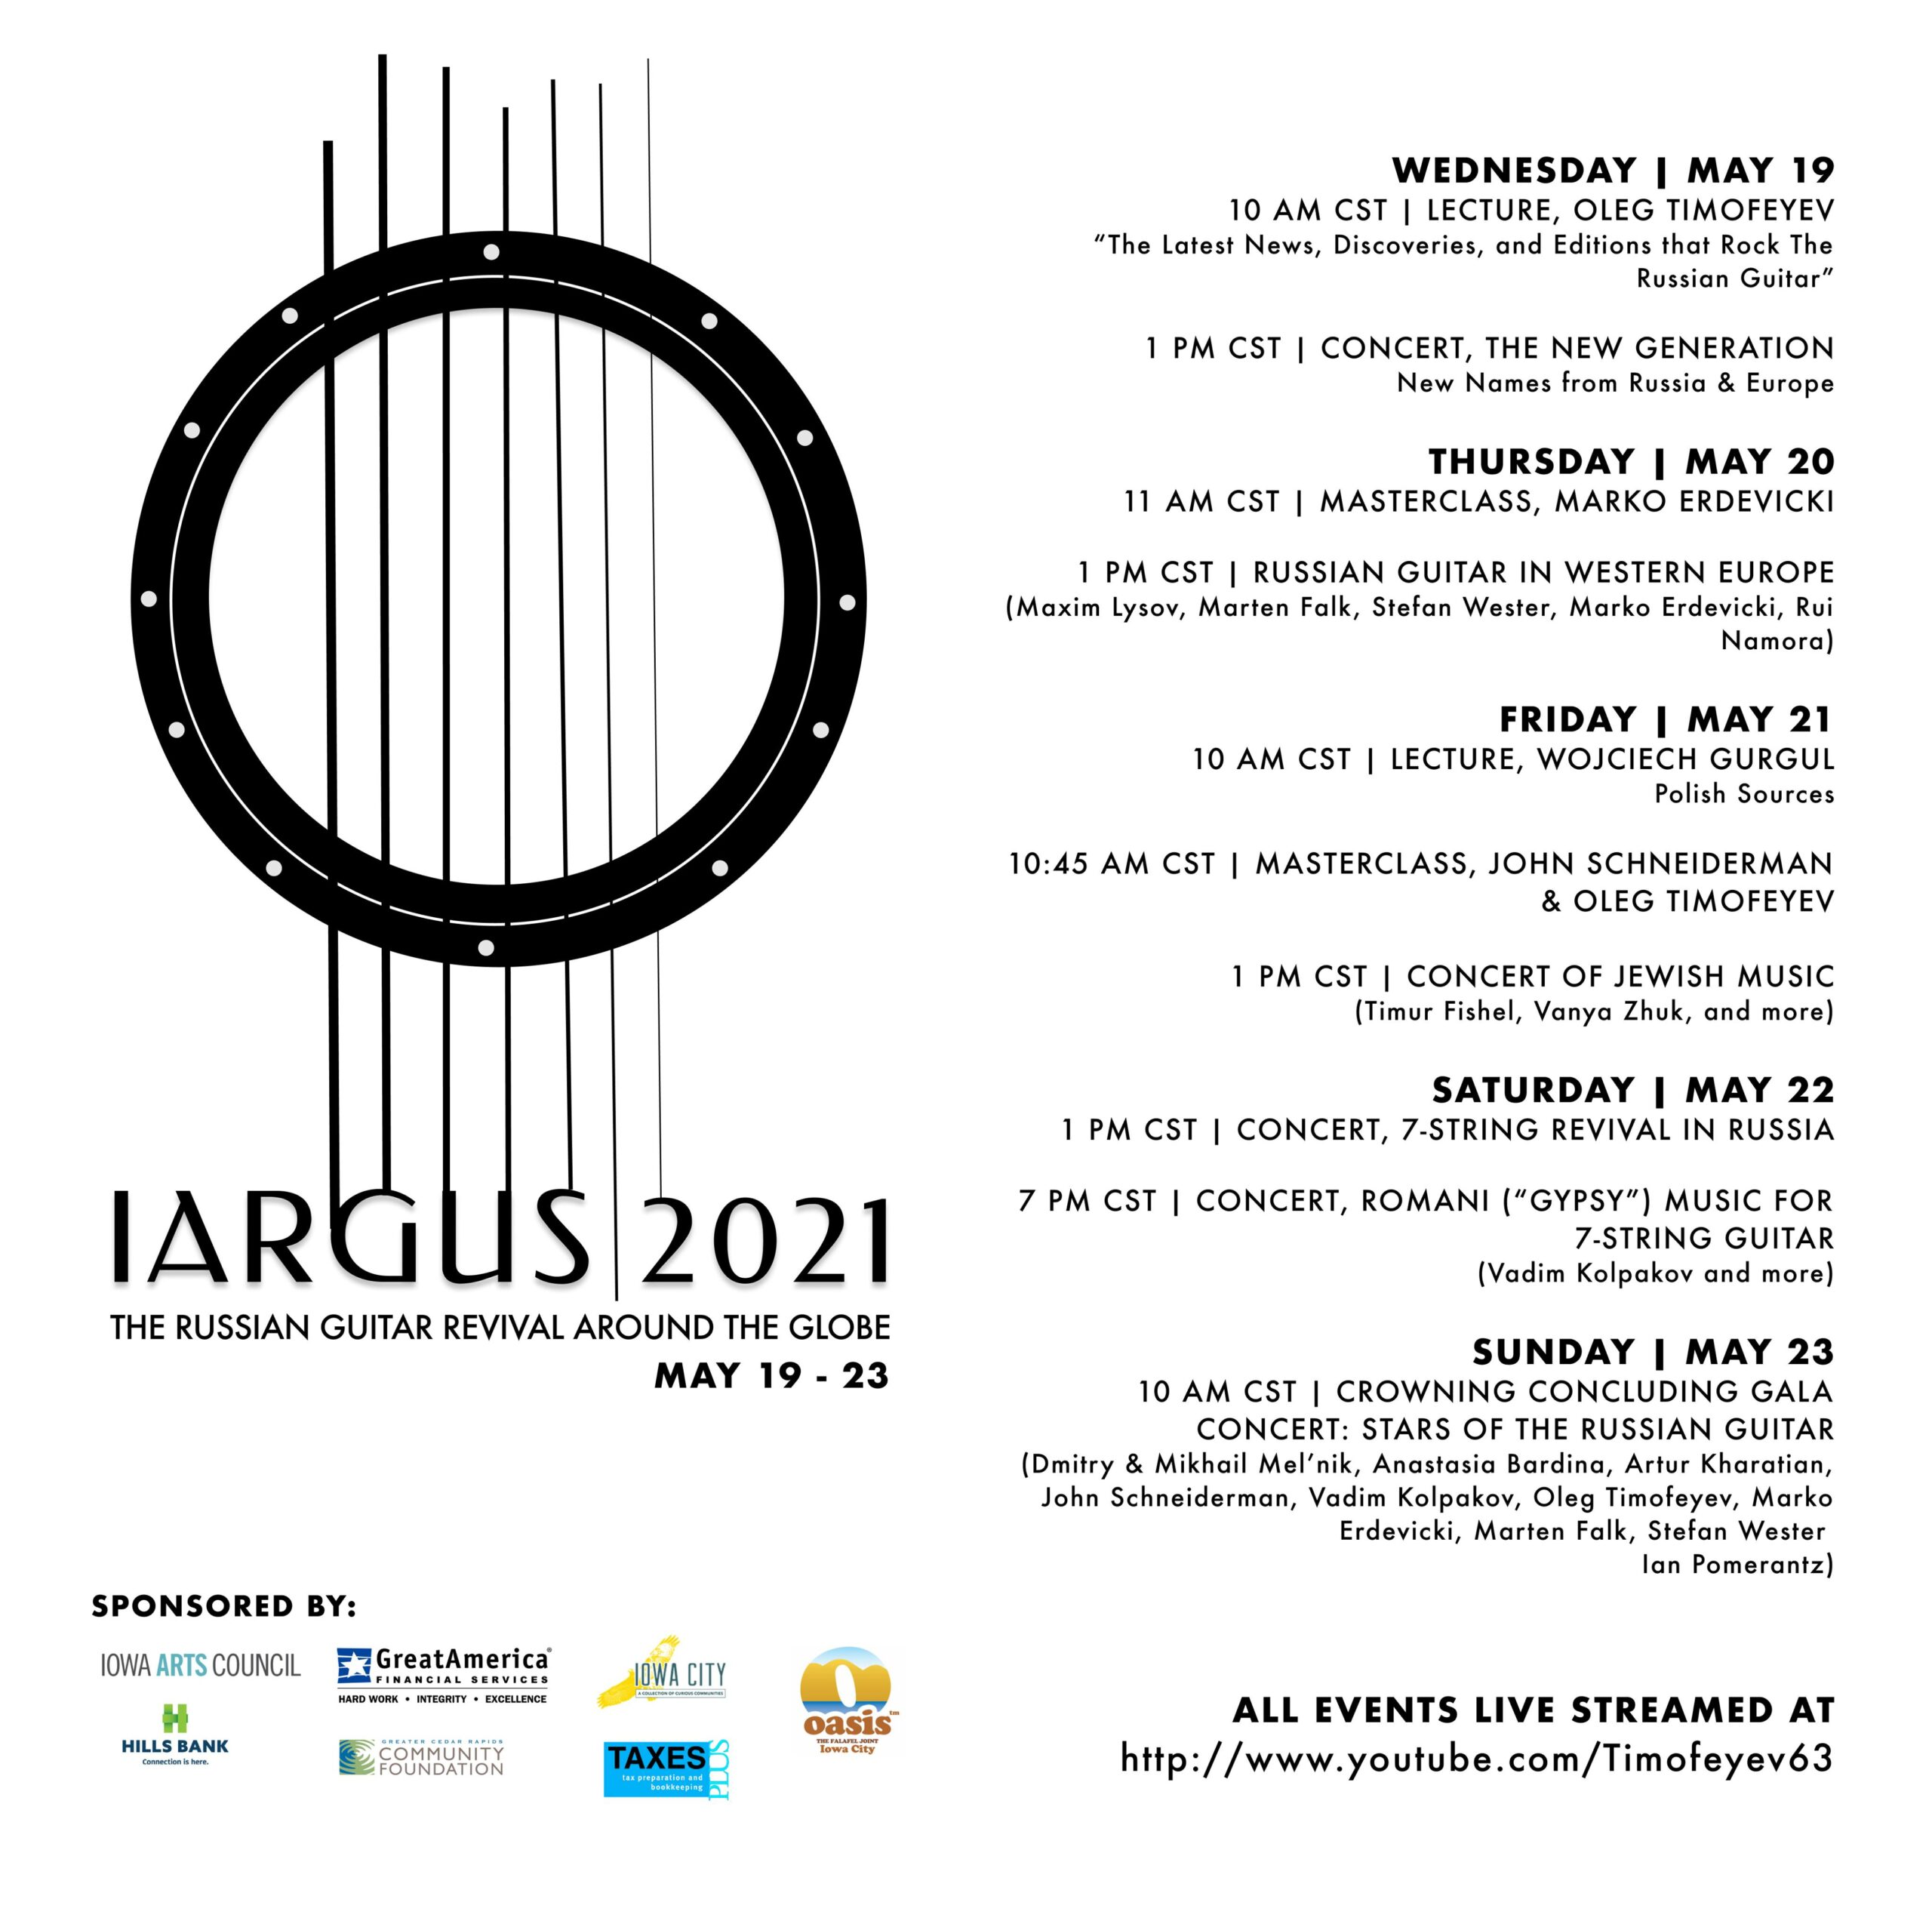 IARGUS 2021 THE RUSSIAN GUITAR REVIVAL AROUND THE GLOBE